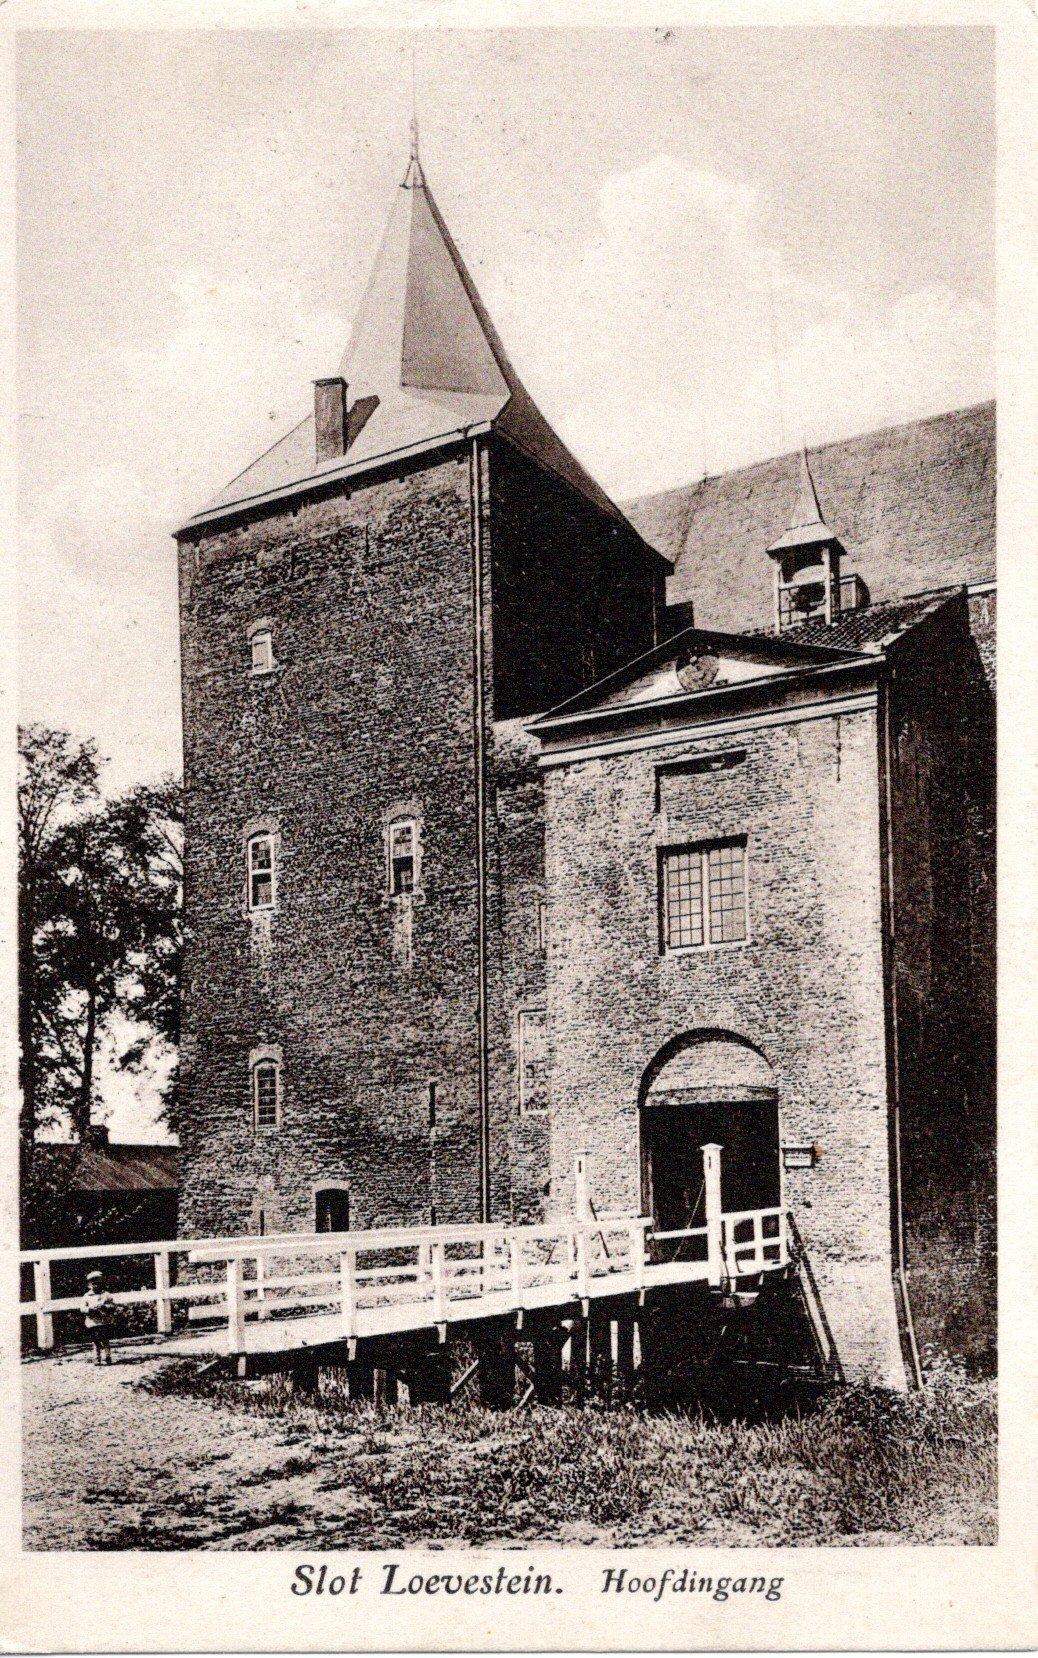 D1-Slot-Loevestein-Hoofdingang-1929